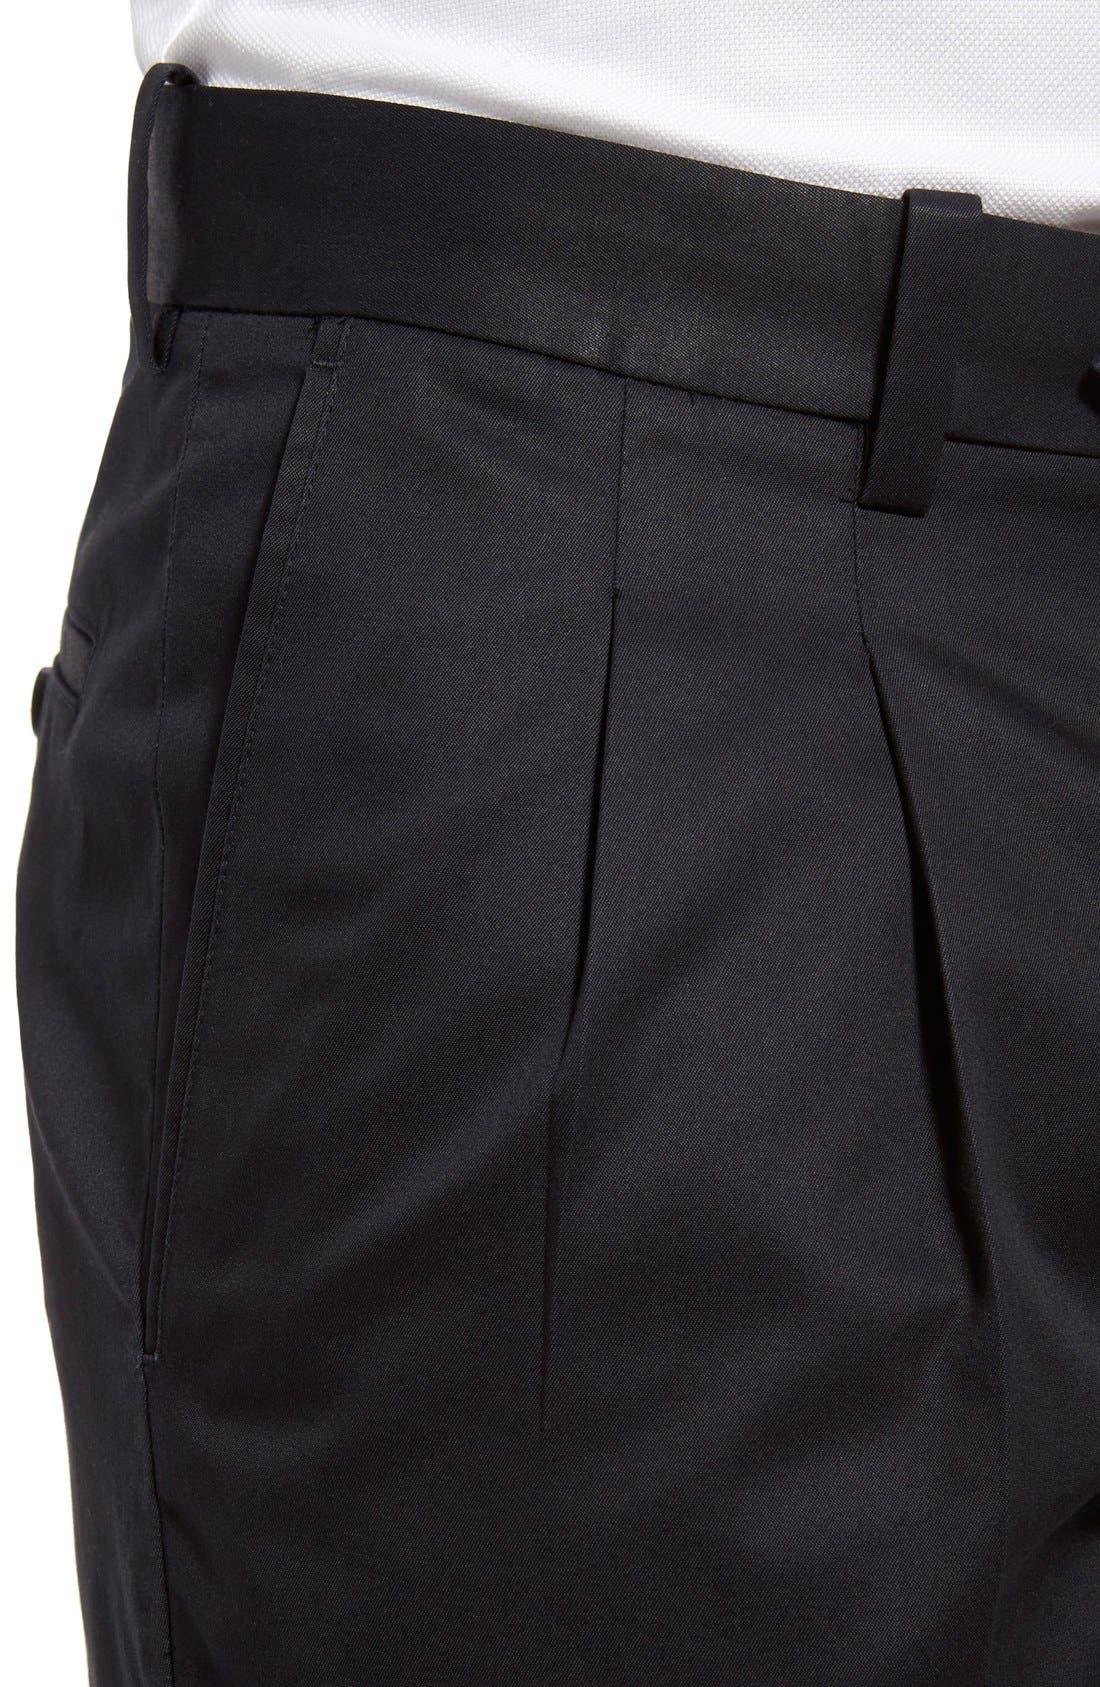 Classic Smartcare<sup>™</sup> Supima<sup>®</sup> Cotton Pleated Trousers,                             Alternate thumbnail 5, color,                             BLACK CAVIAR